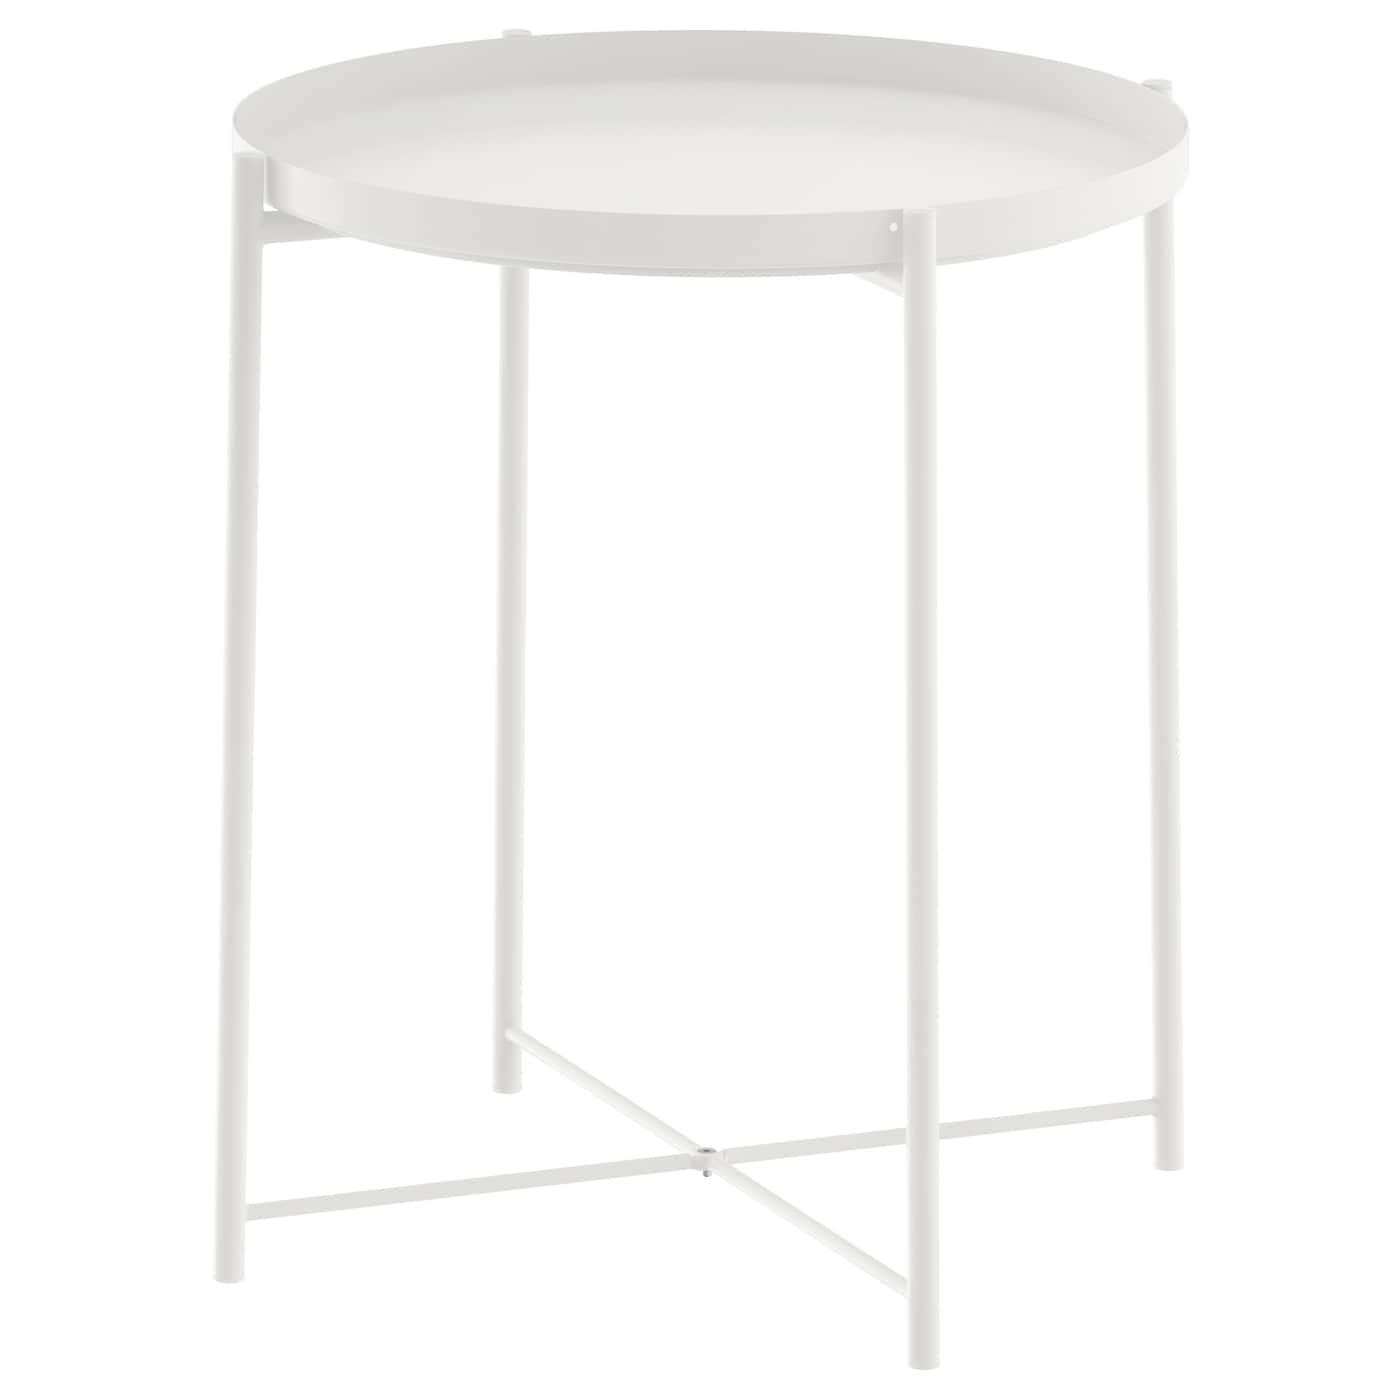 GLADOM Tray table - white - IKEA